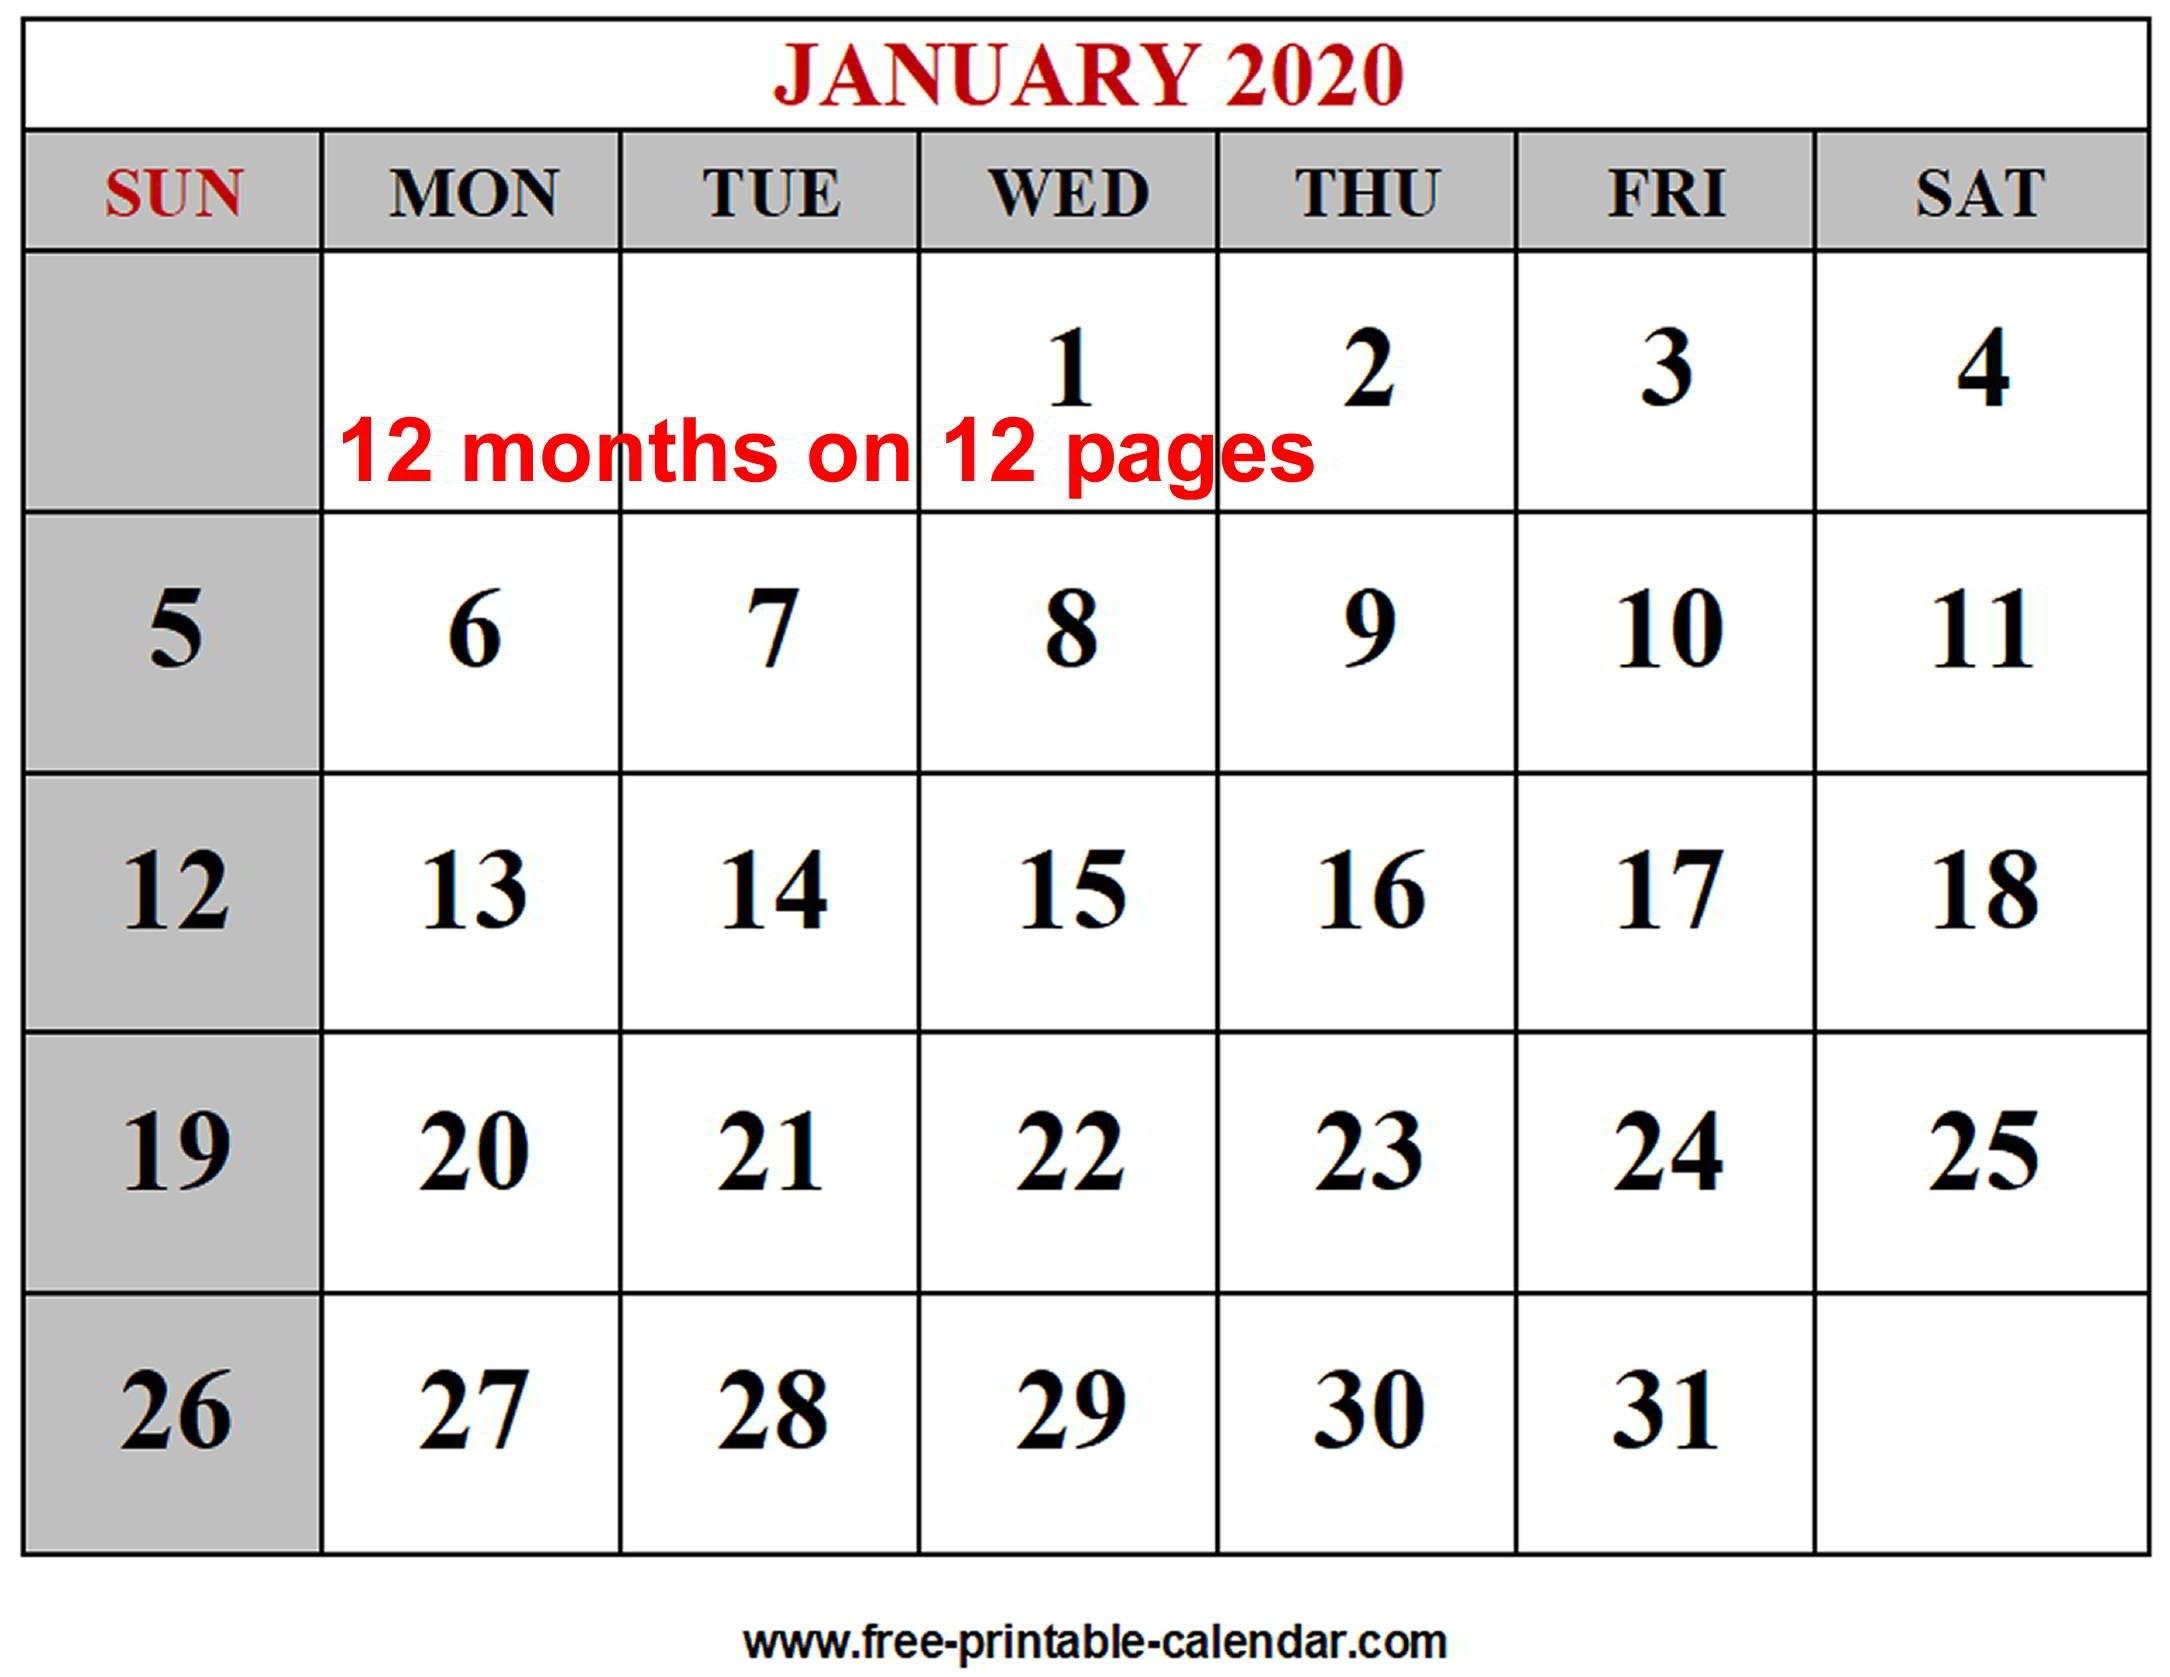 Year 2020 Calendar Templates - Free-Printable-Calendar-Free Printable Two Page Monthly Calendar 2020